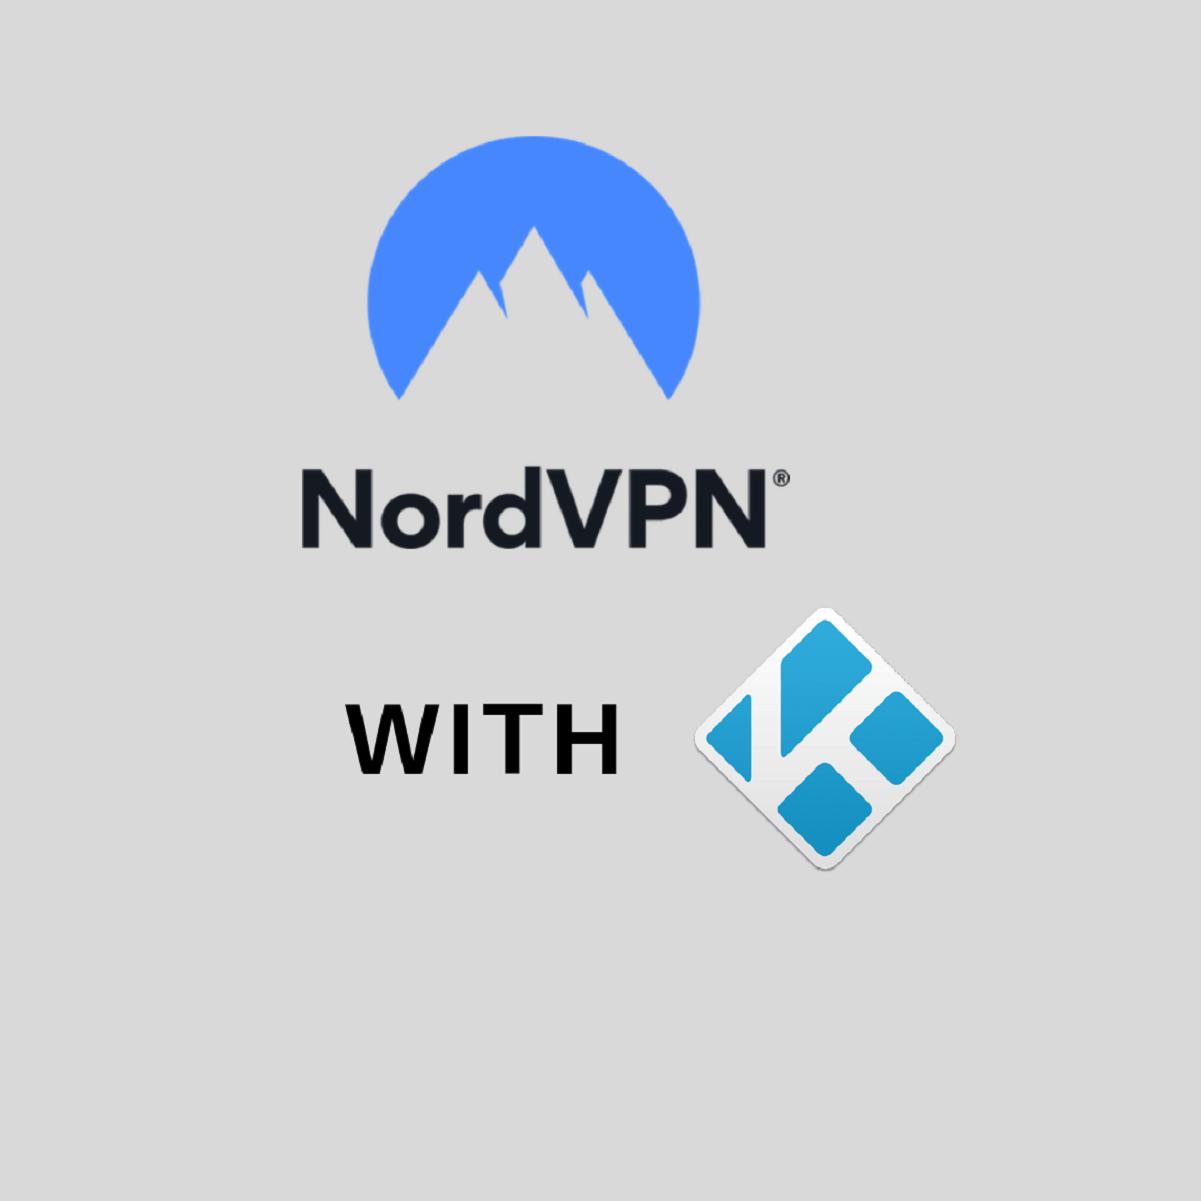 NordVPN Kodi: How to Setup NordVPN on Kodi and How to Use it